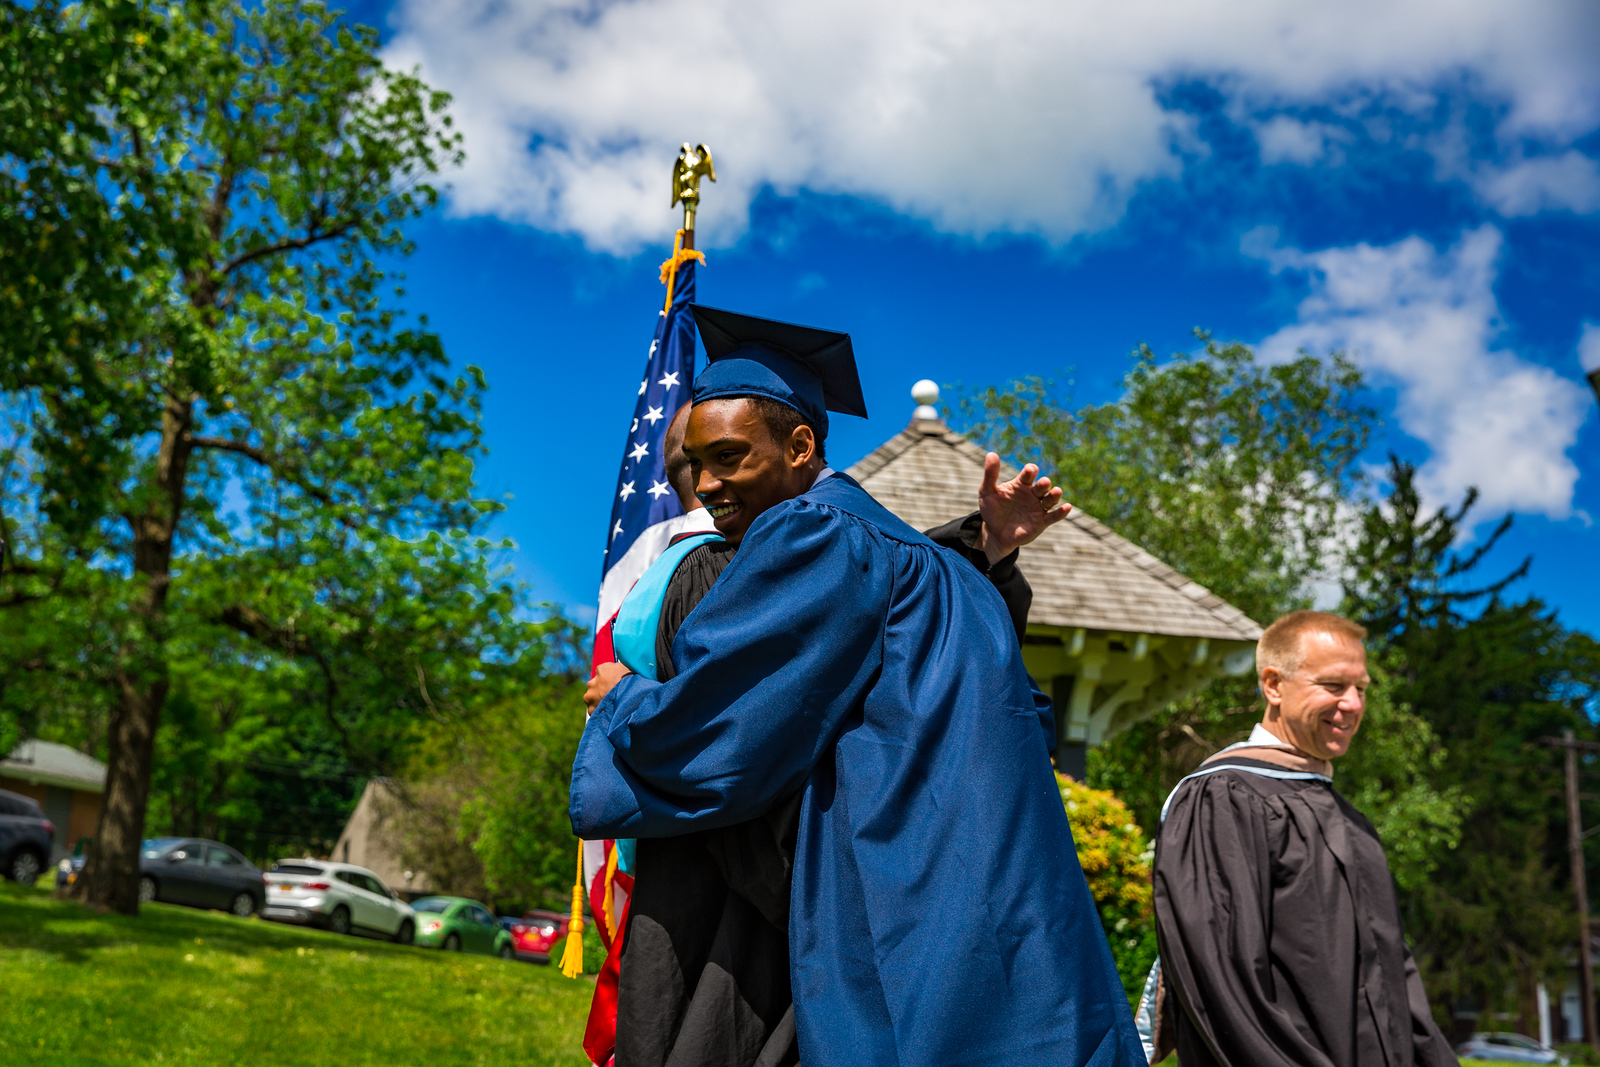 Mr. Lewis embraces Elijah Barnett on receiving his diploma